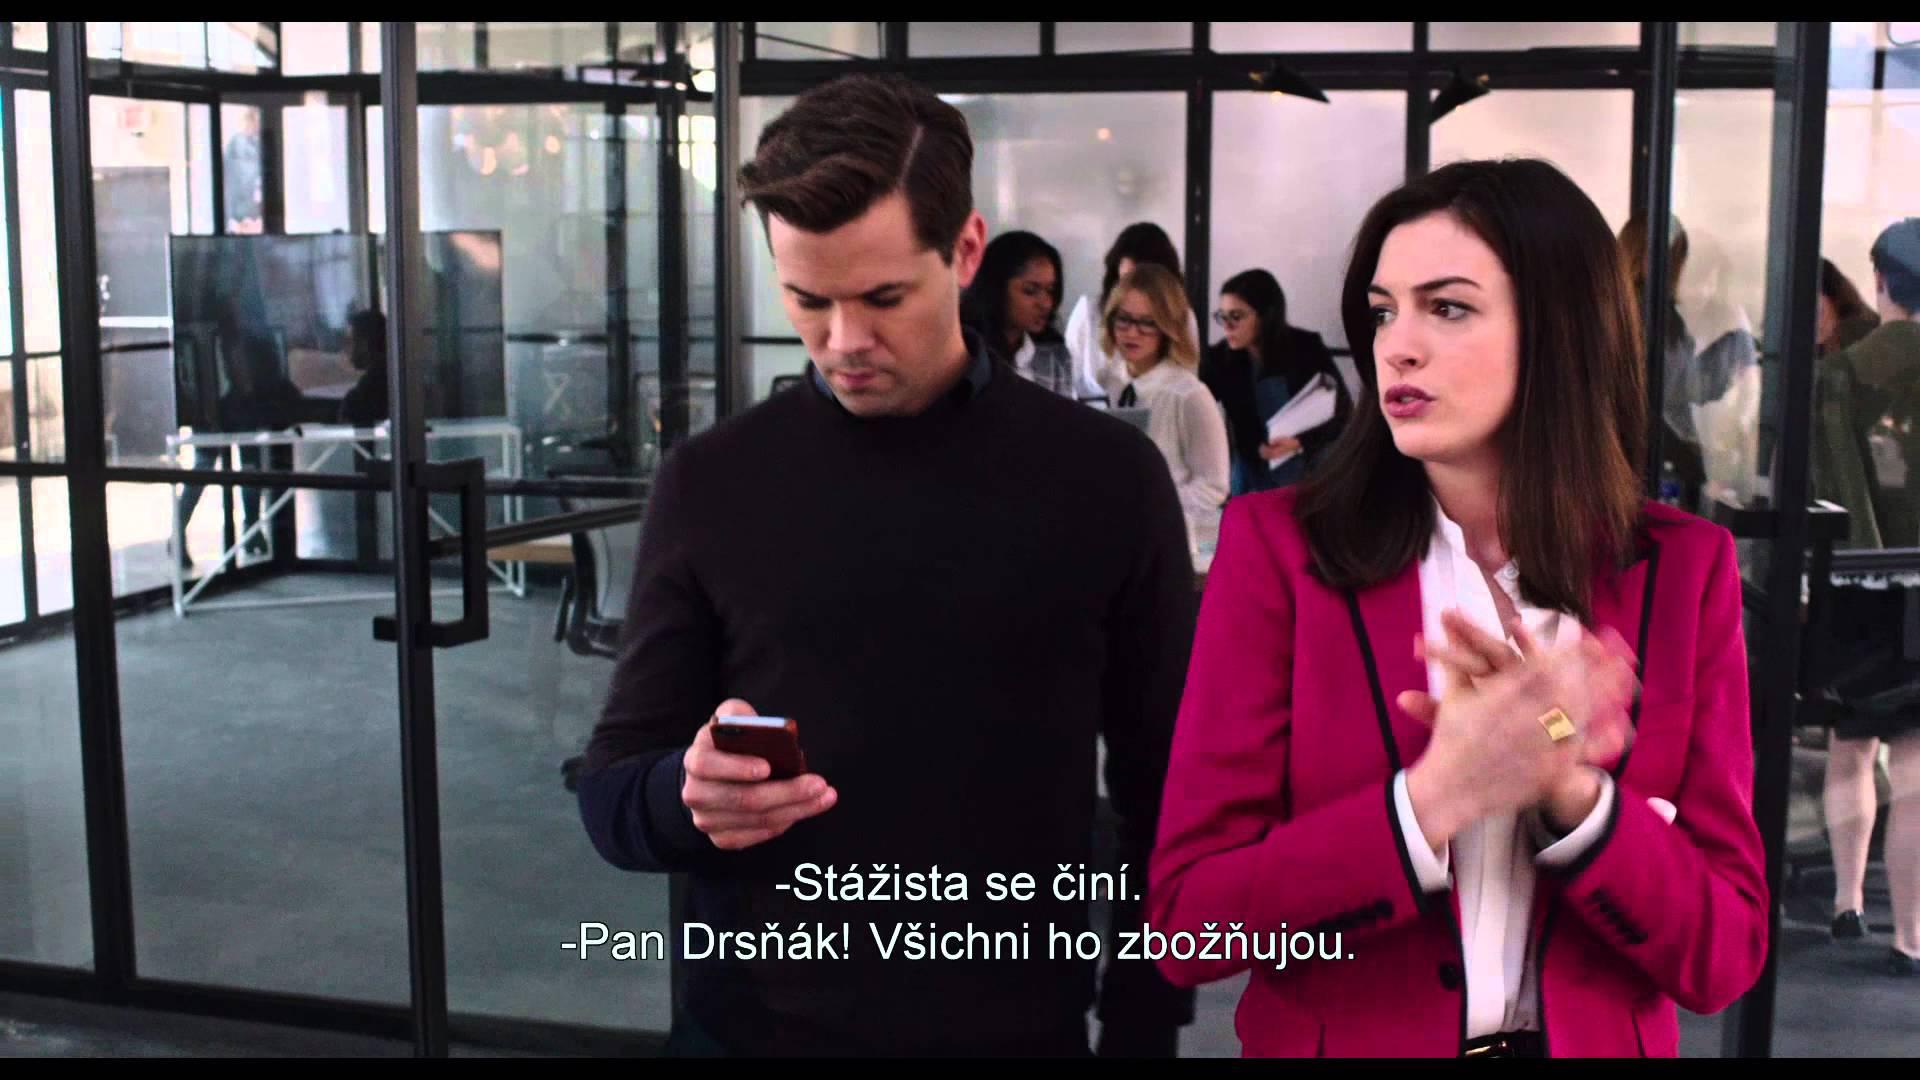 Stážista - trailer s českými titulky